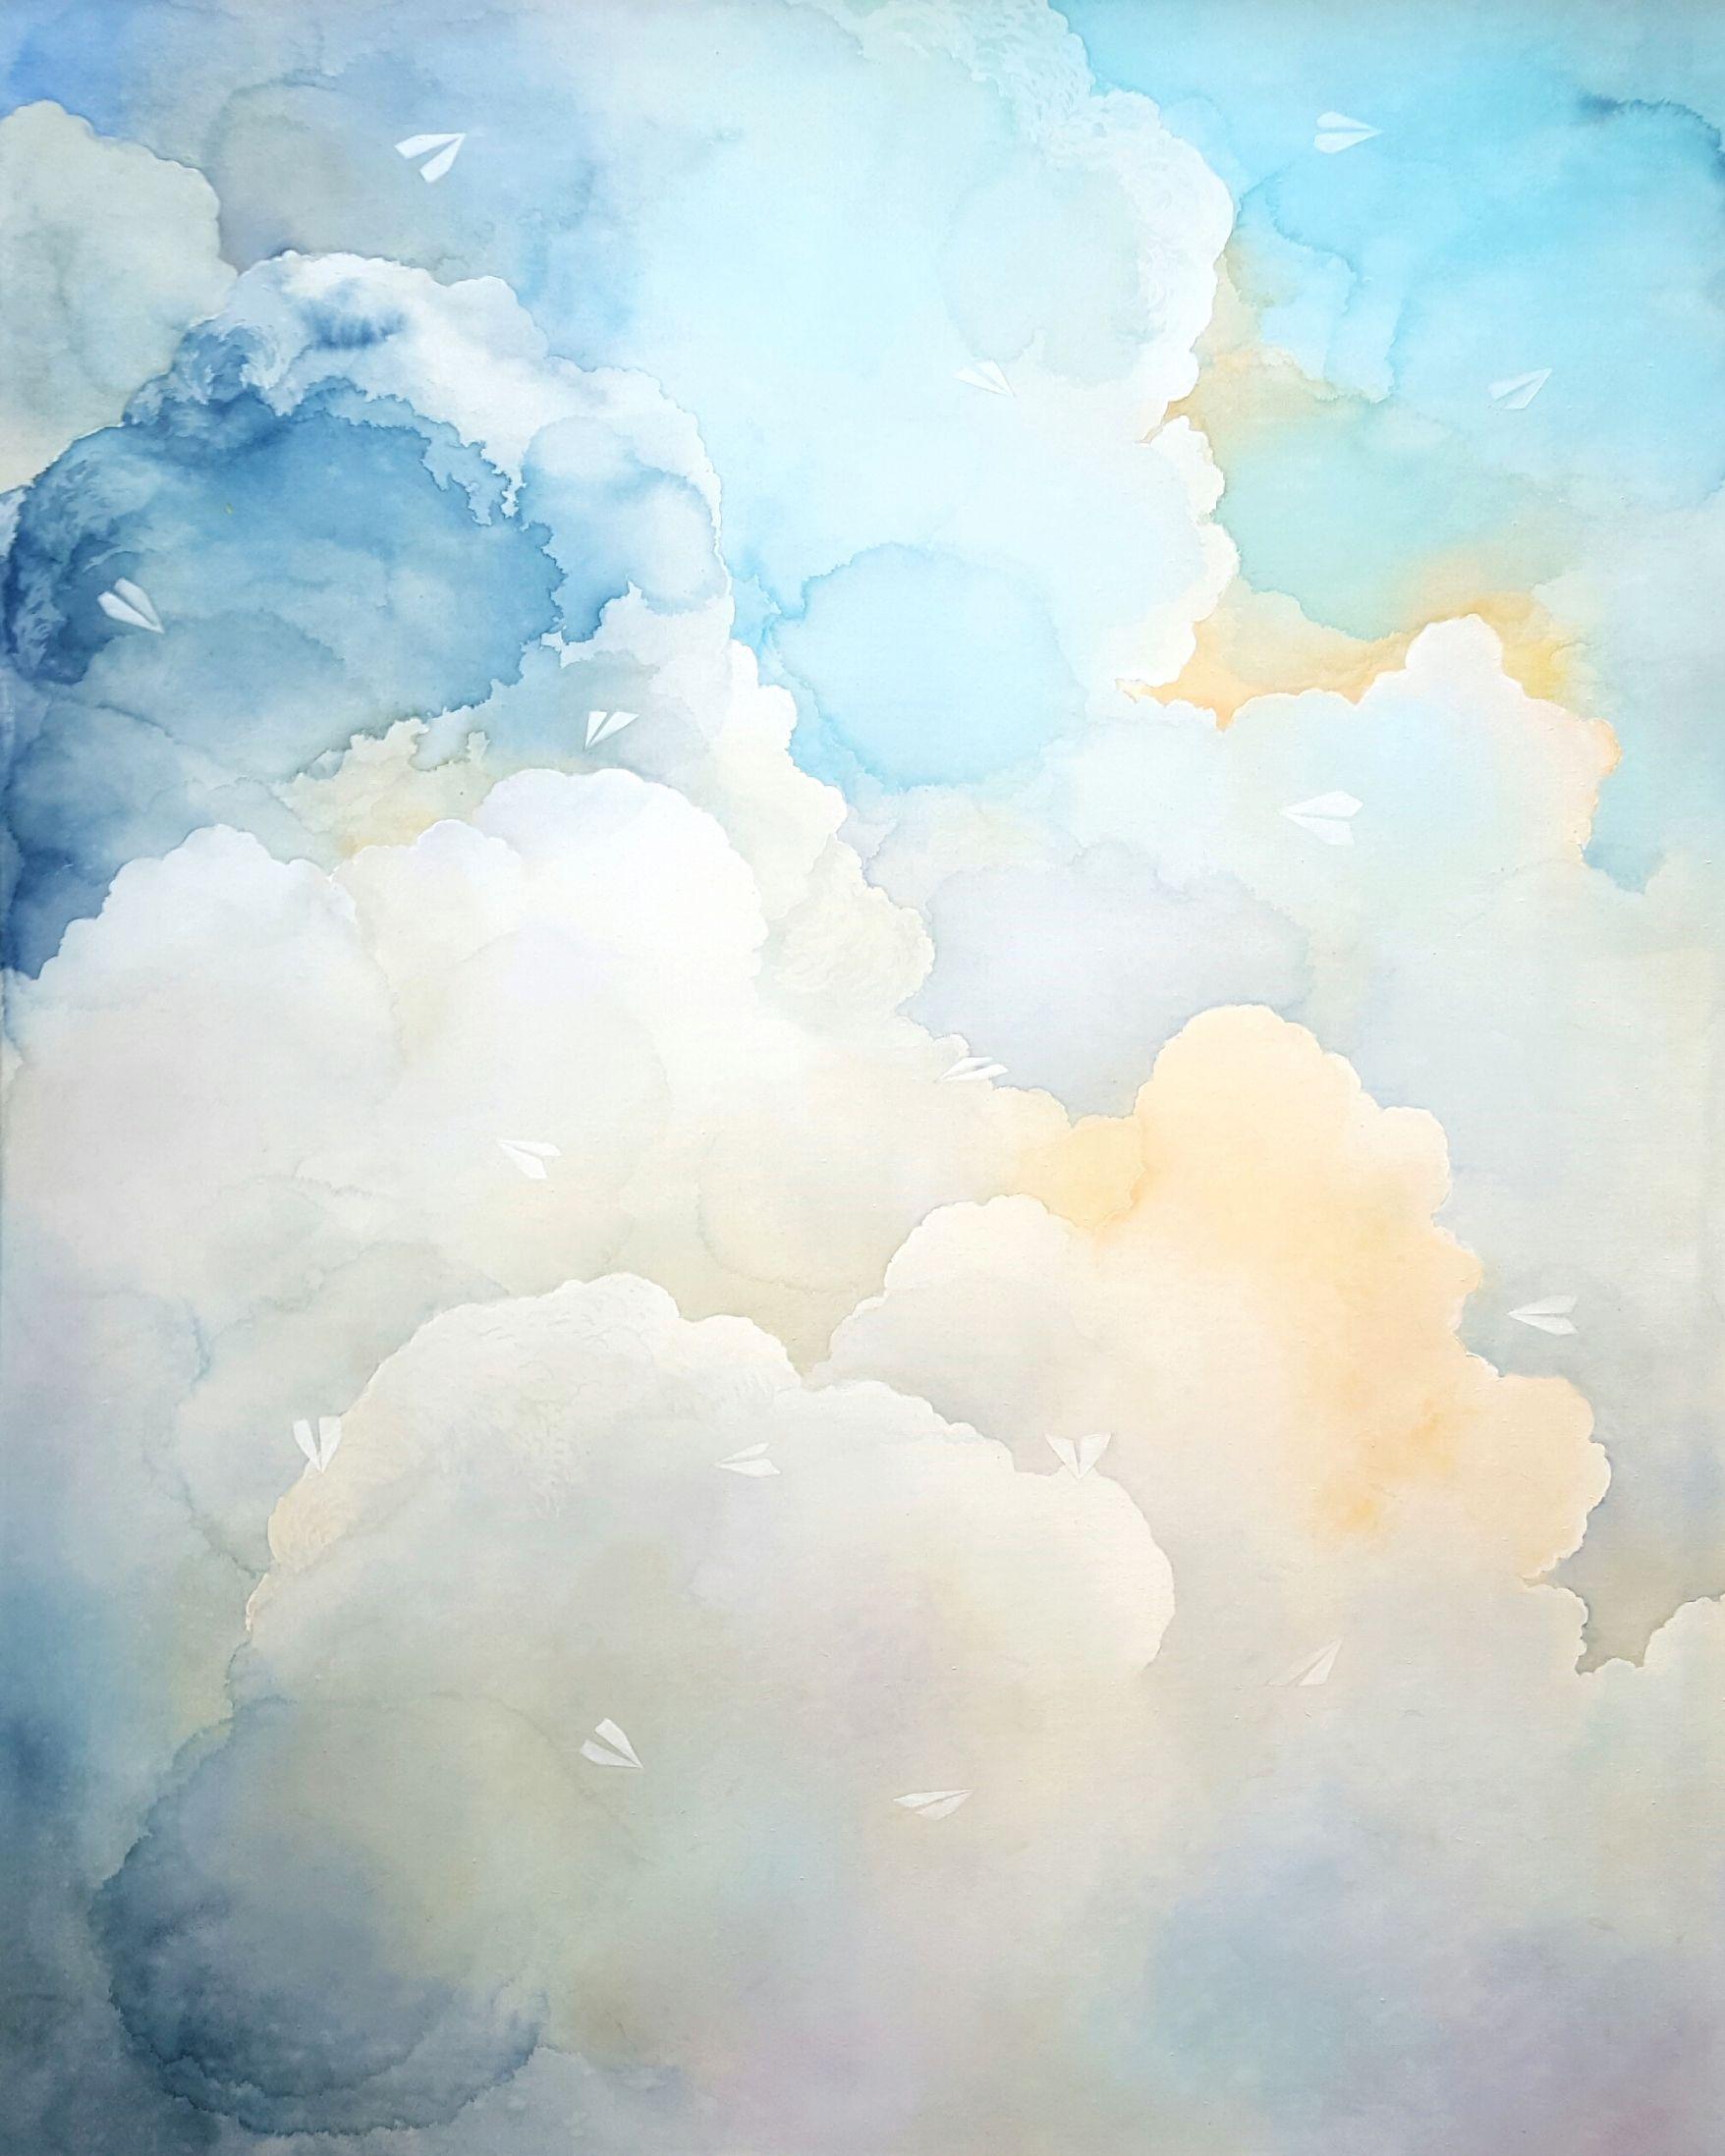 Art Watercolor Blue Watercolour Wash Texture Inspiration